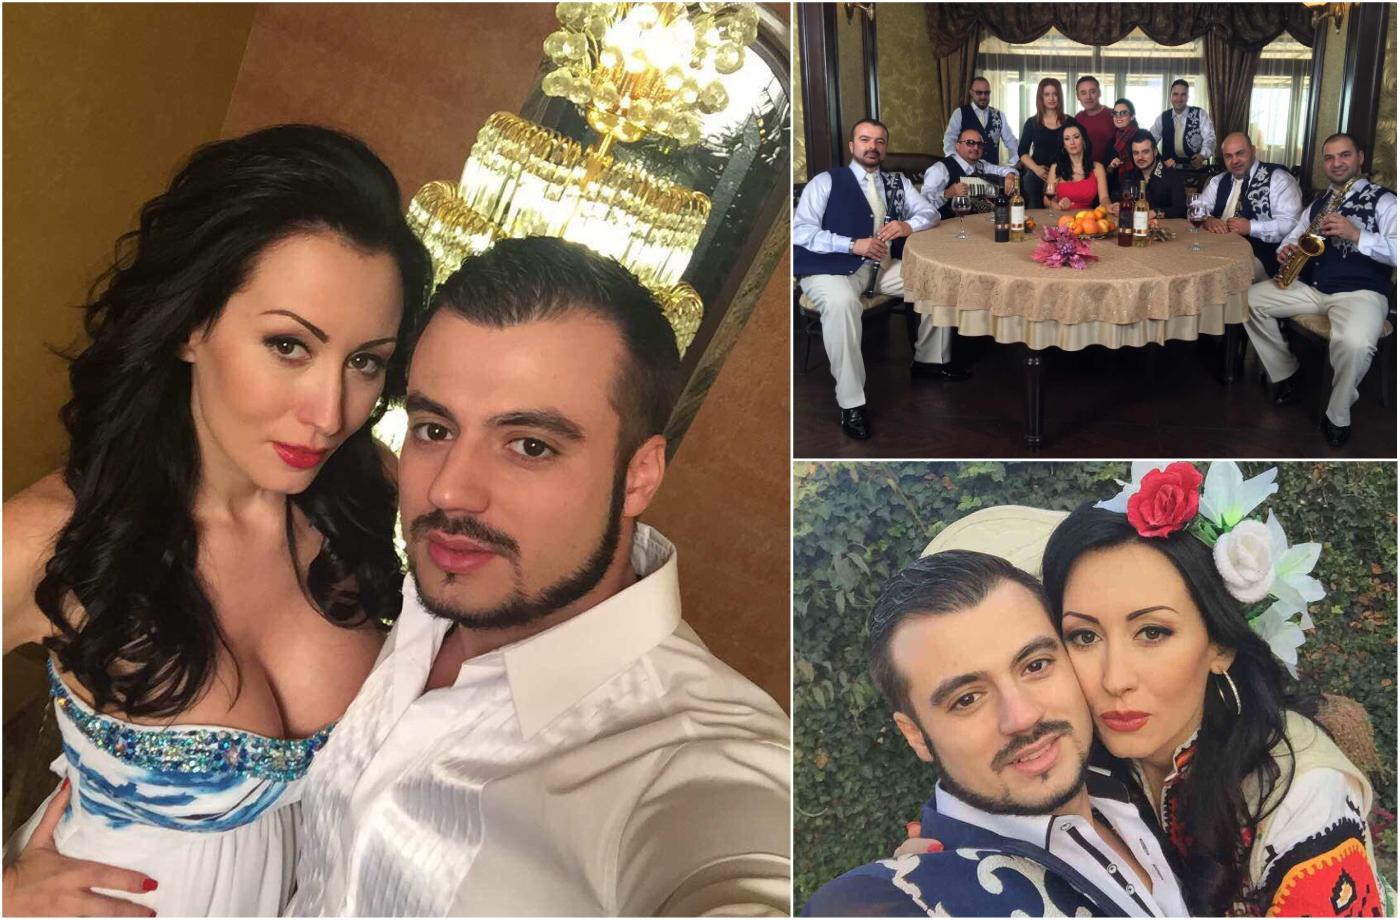 Джена и Атанас Стоев-младши с нов дует